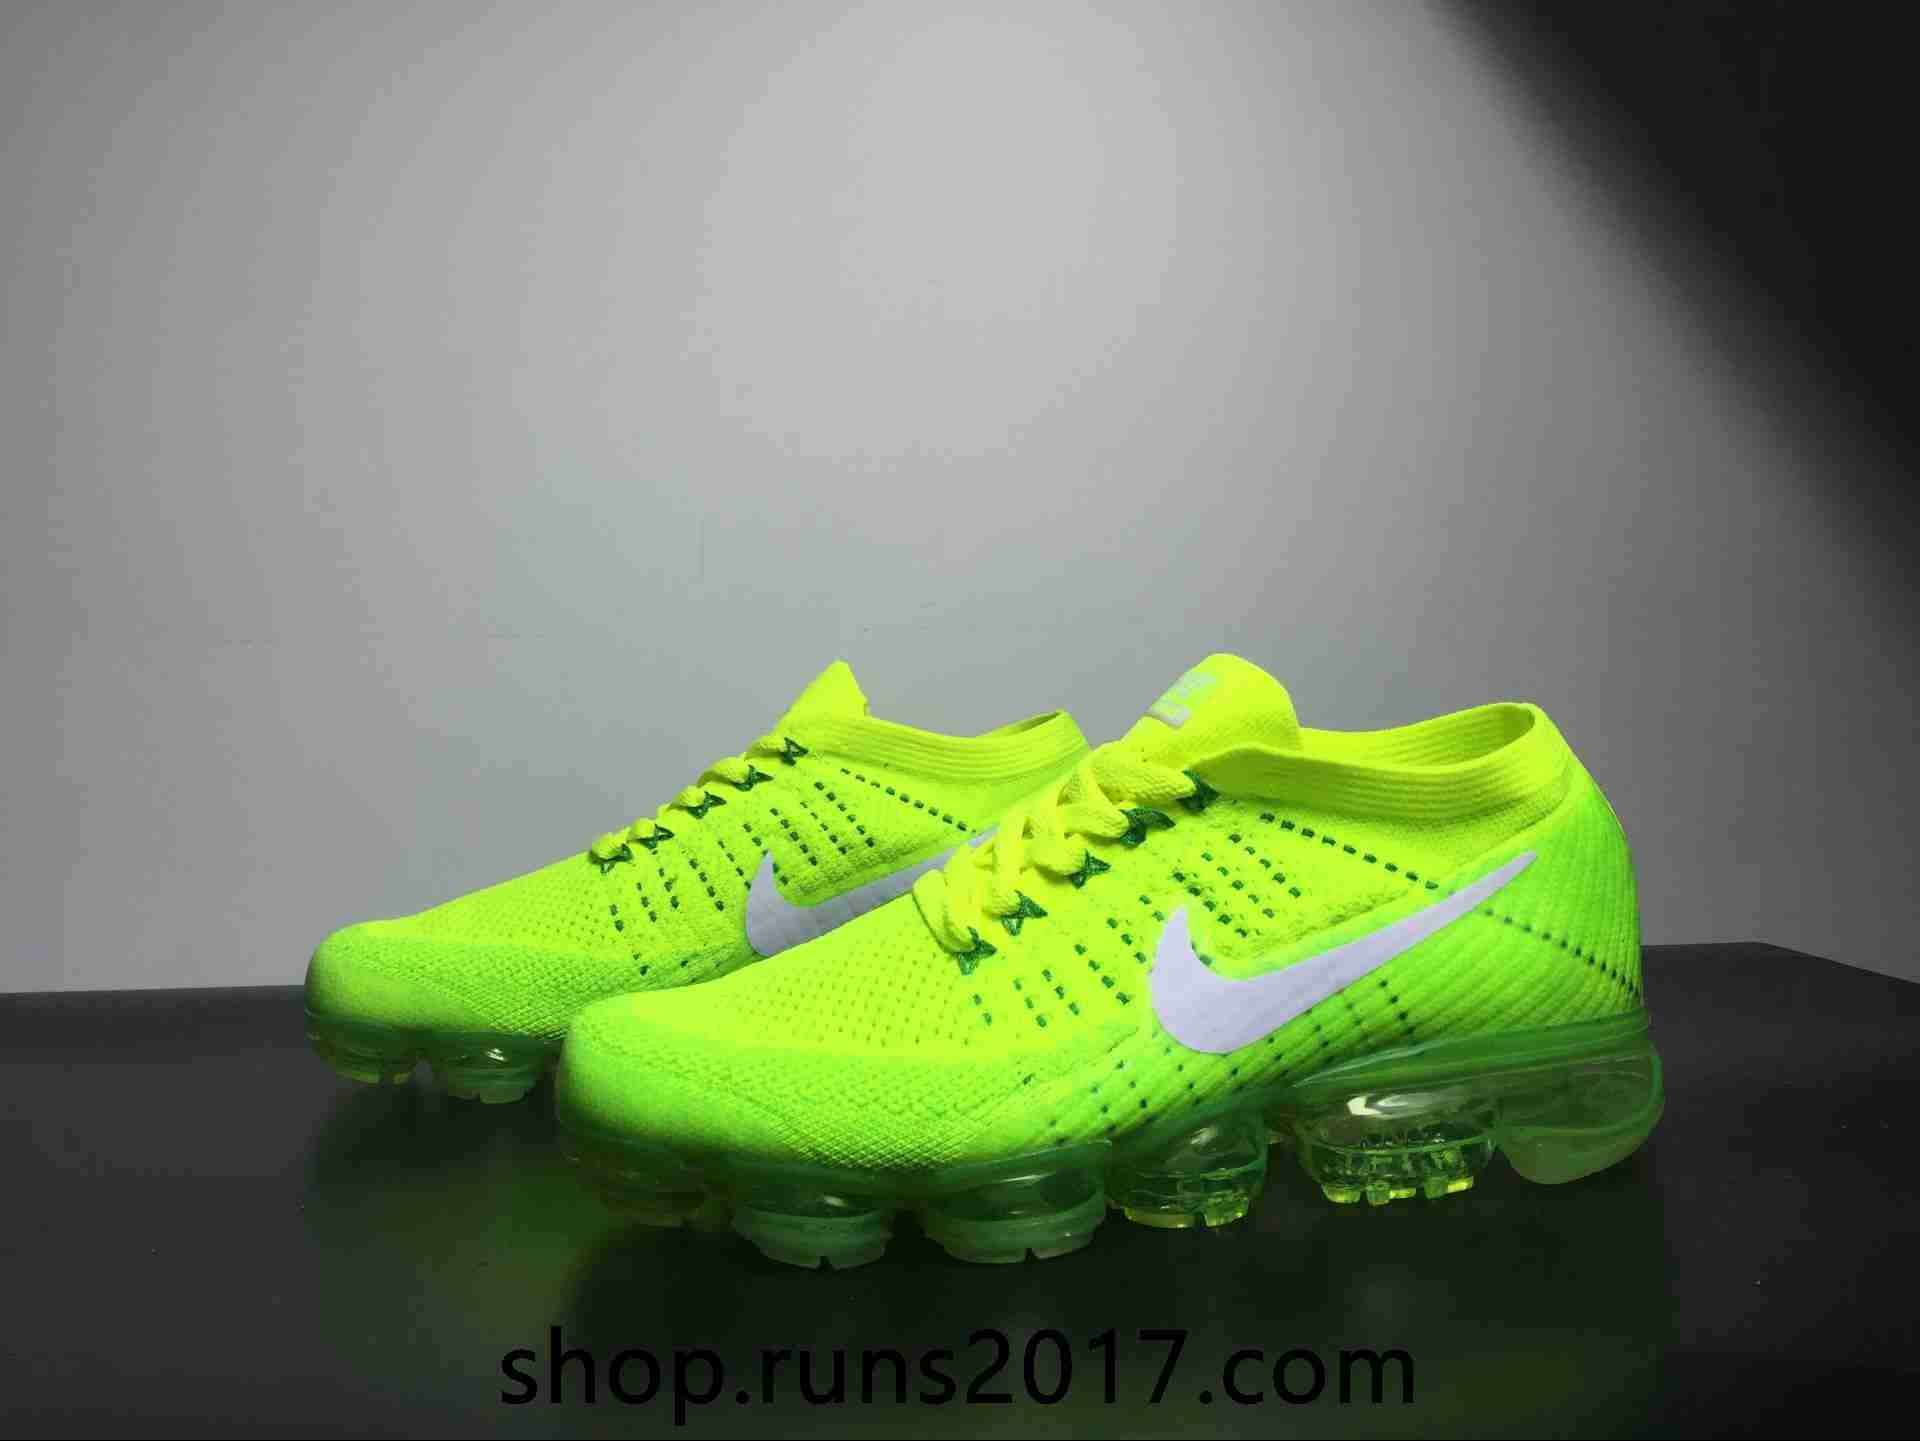 neon green vapormax